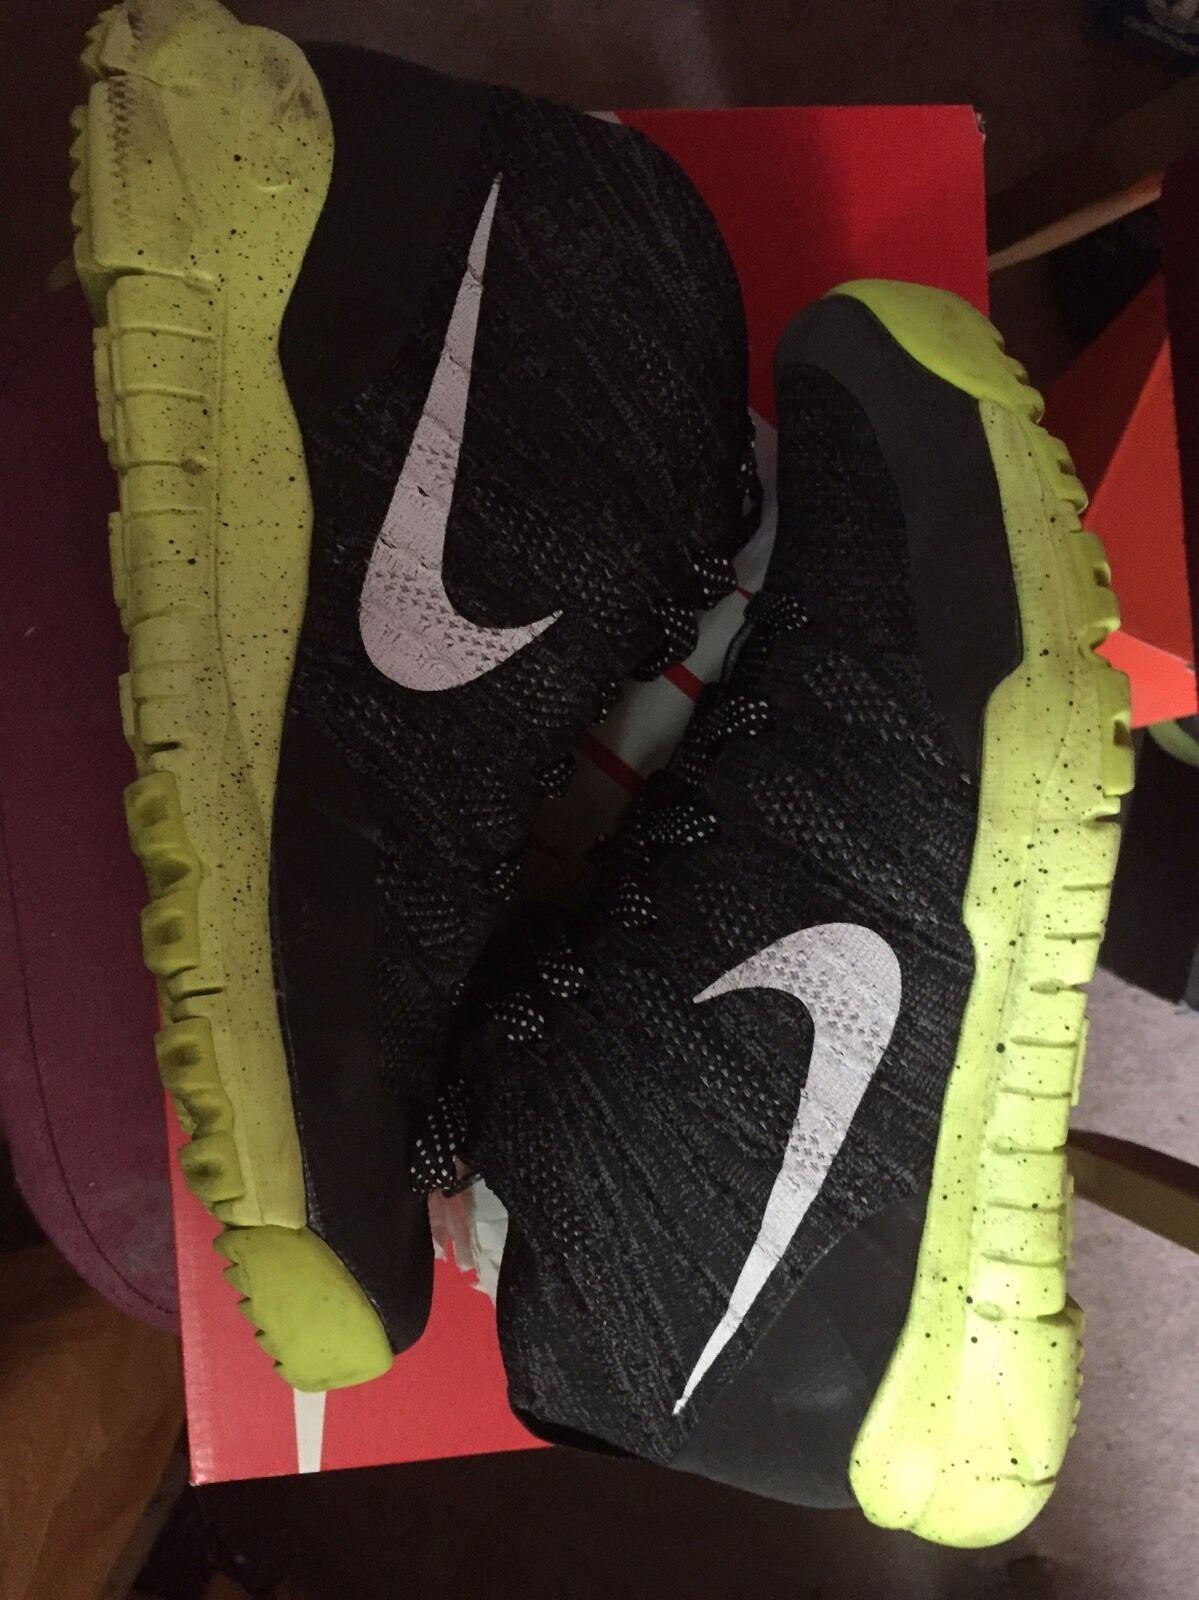 Nike Flyknit Size Trainer Chukka FSB Charcoal/Volt Size Flyknit 10.5 c68426